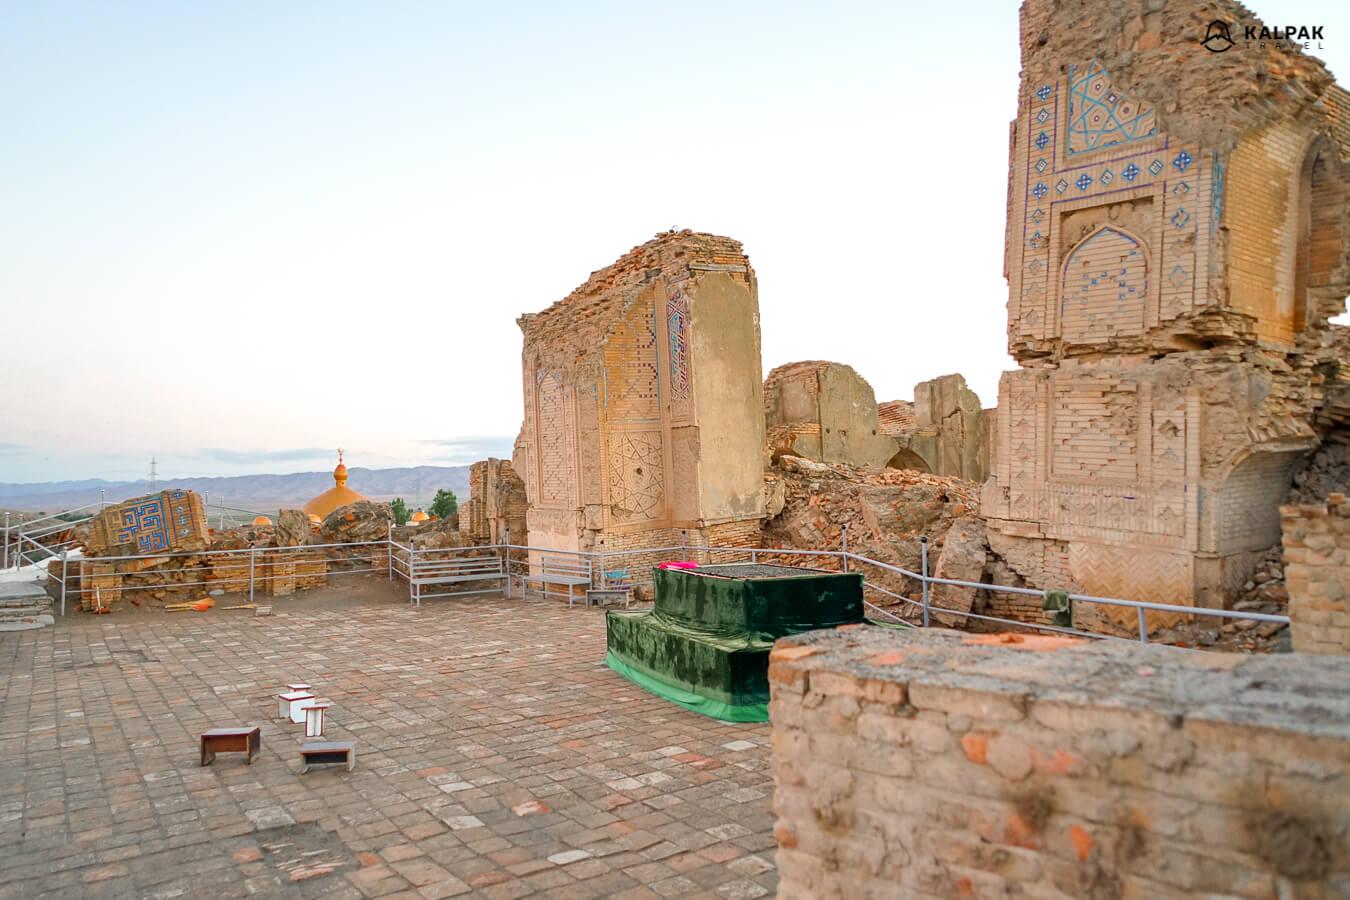 Turkmenistan Tours & Travel Information - Kalpak Travel